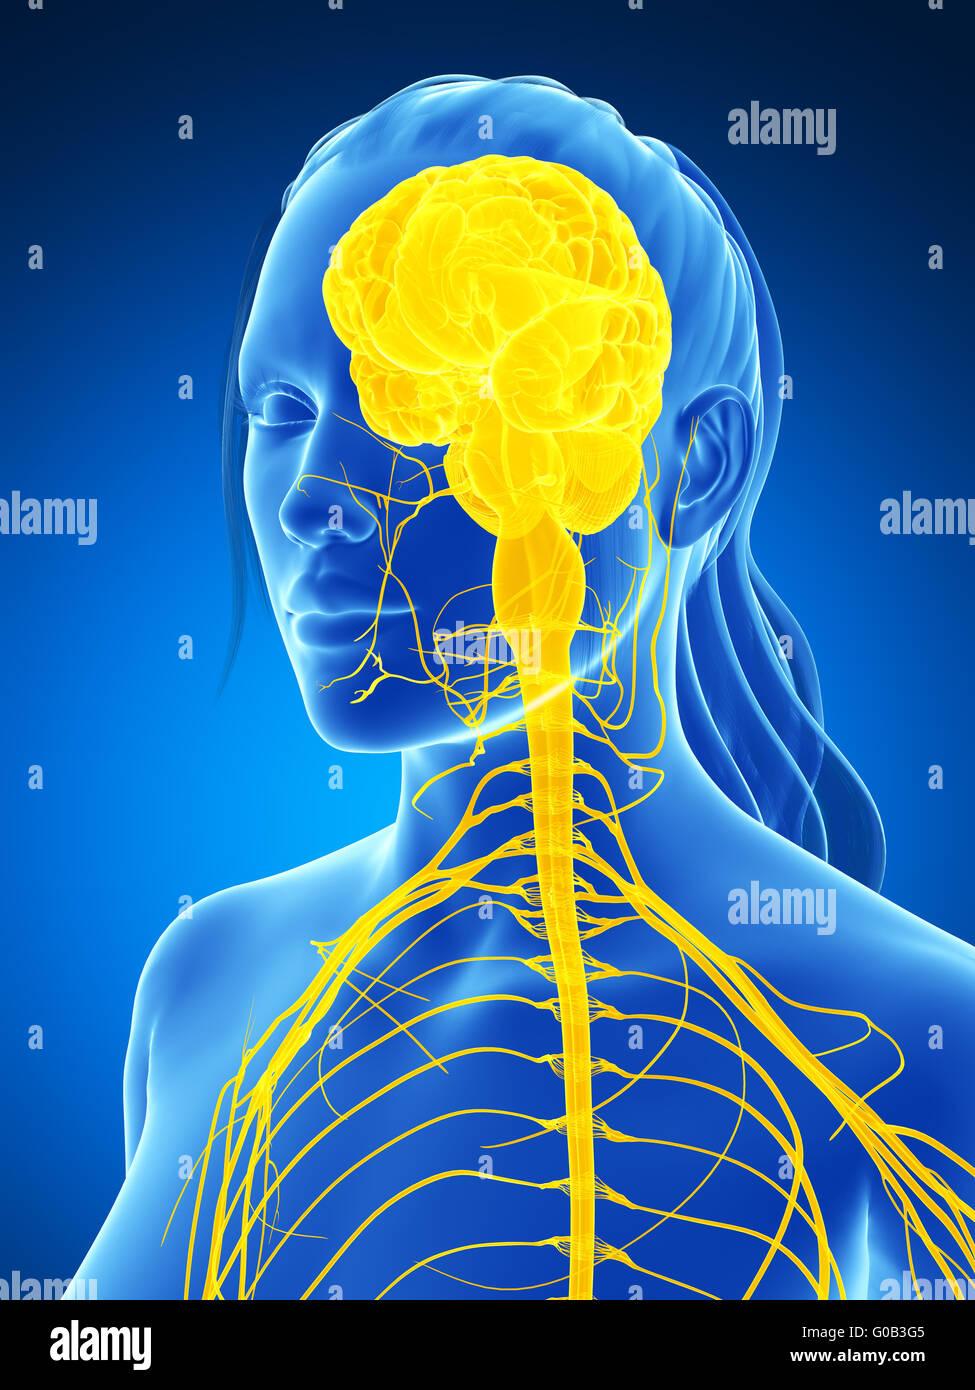 3d rendered illustration of the female nervous system - Stock Image